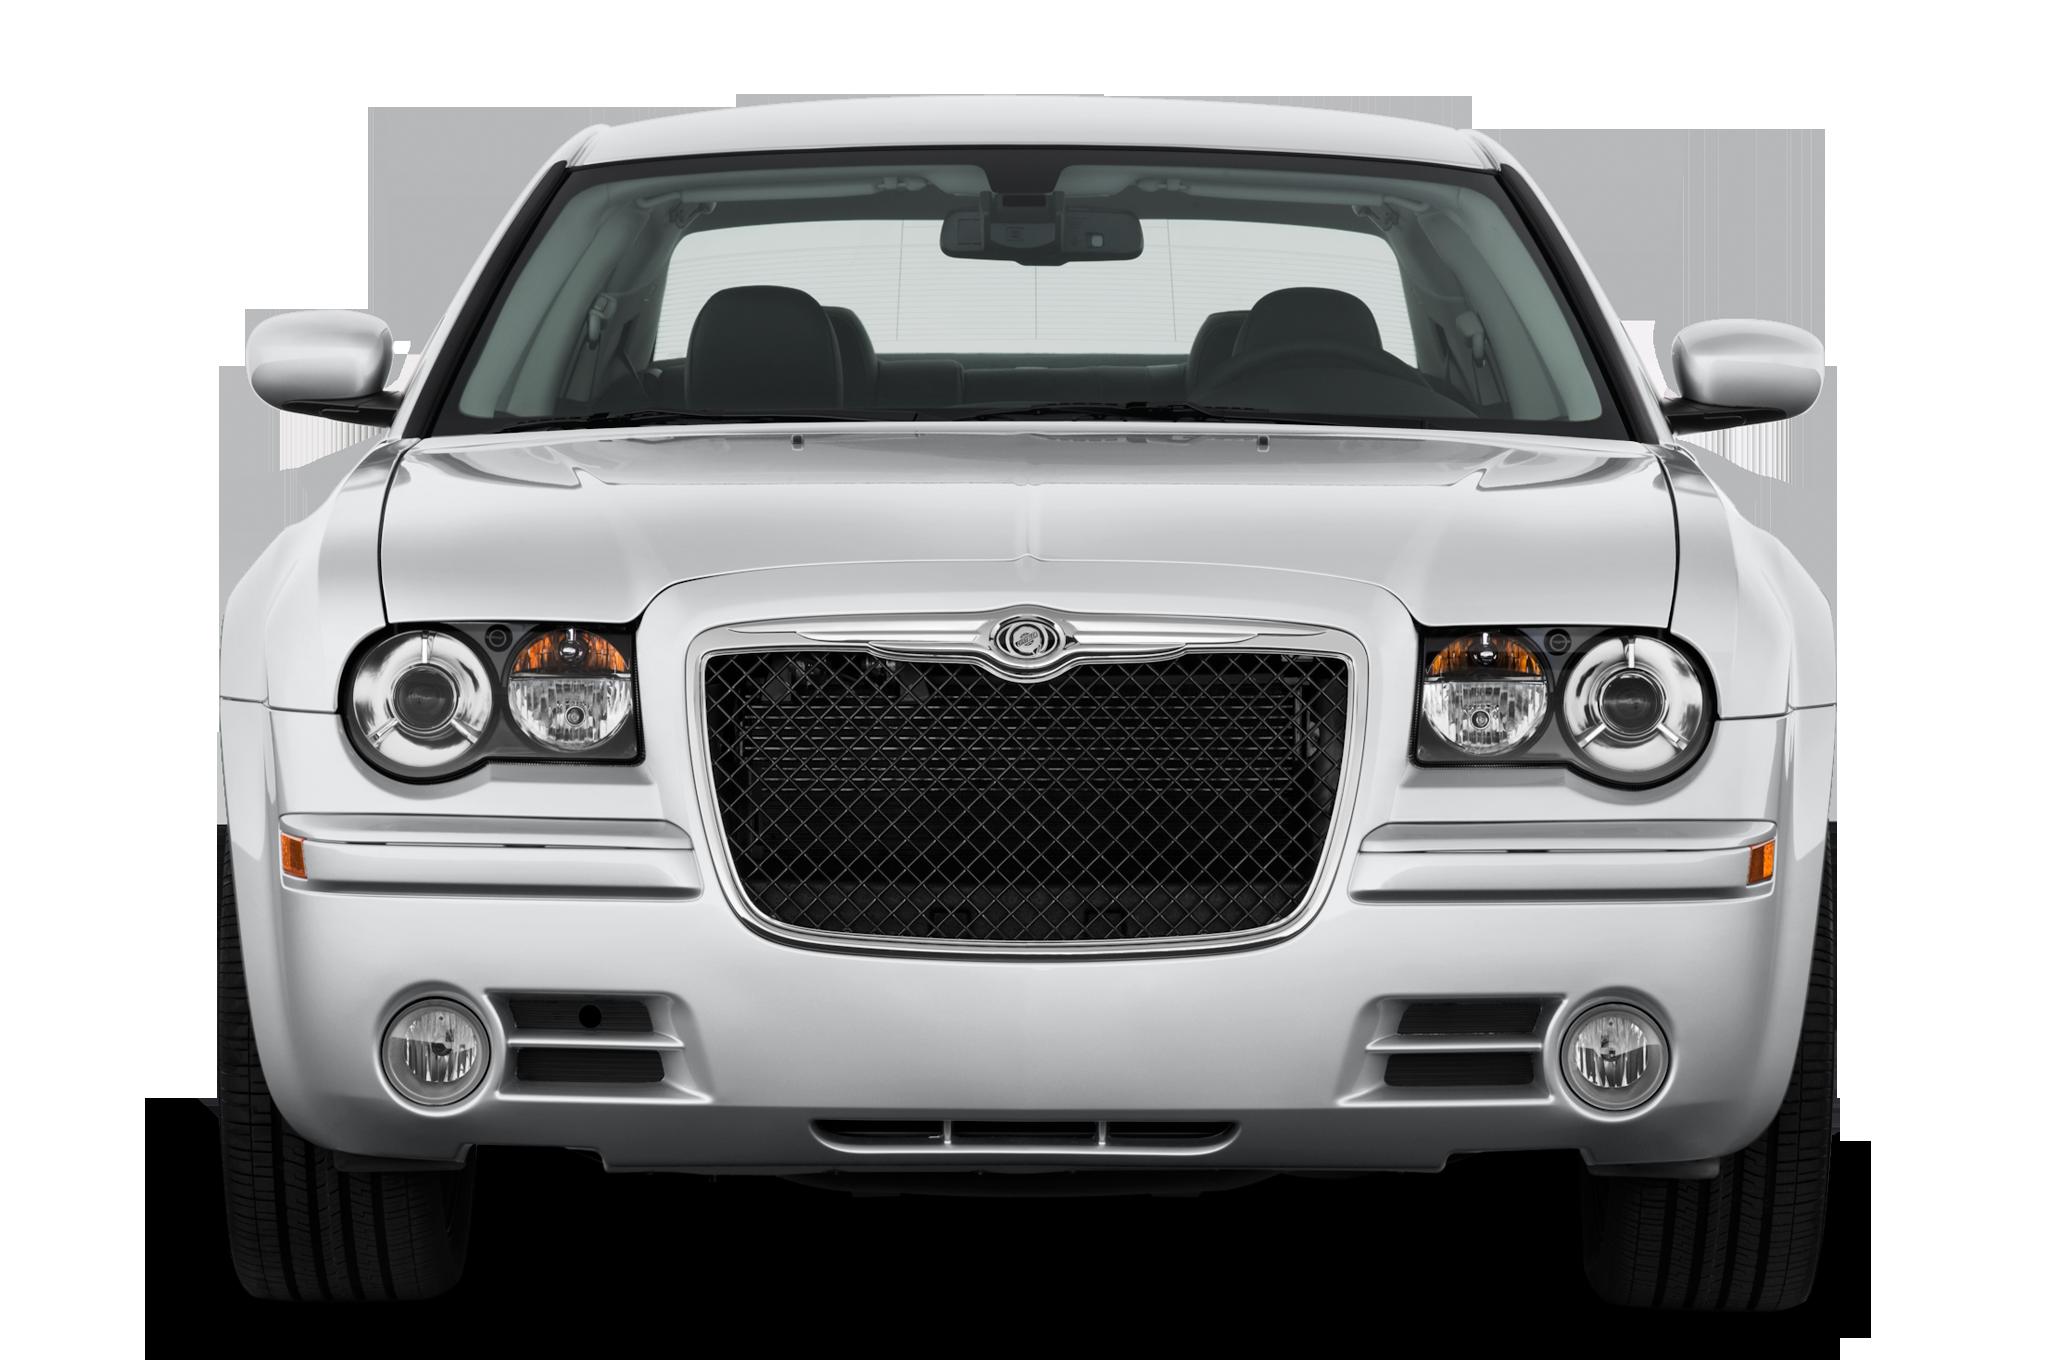 2010 chrysler 300 s v8 sedan front view recall central chrysler recalls expand to wrangler, minivans; bmw  at alyssarenee.co